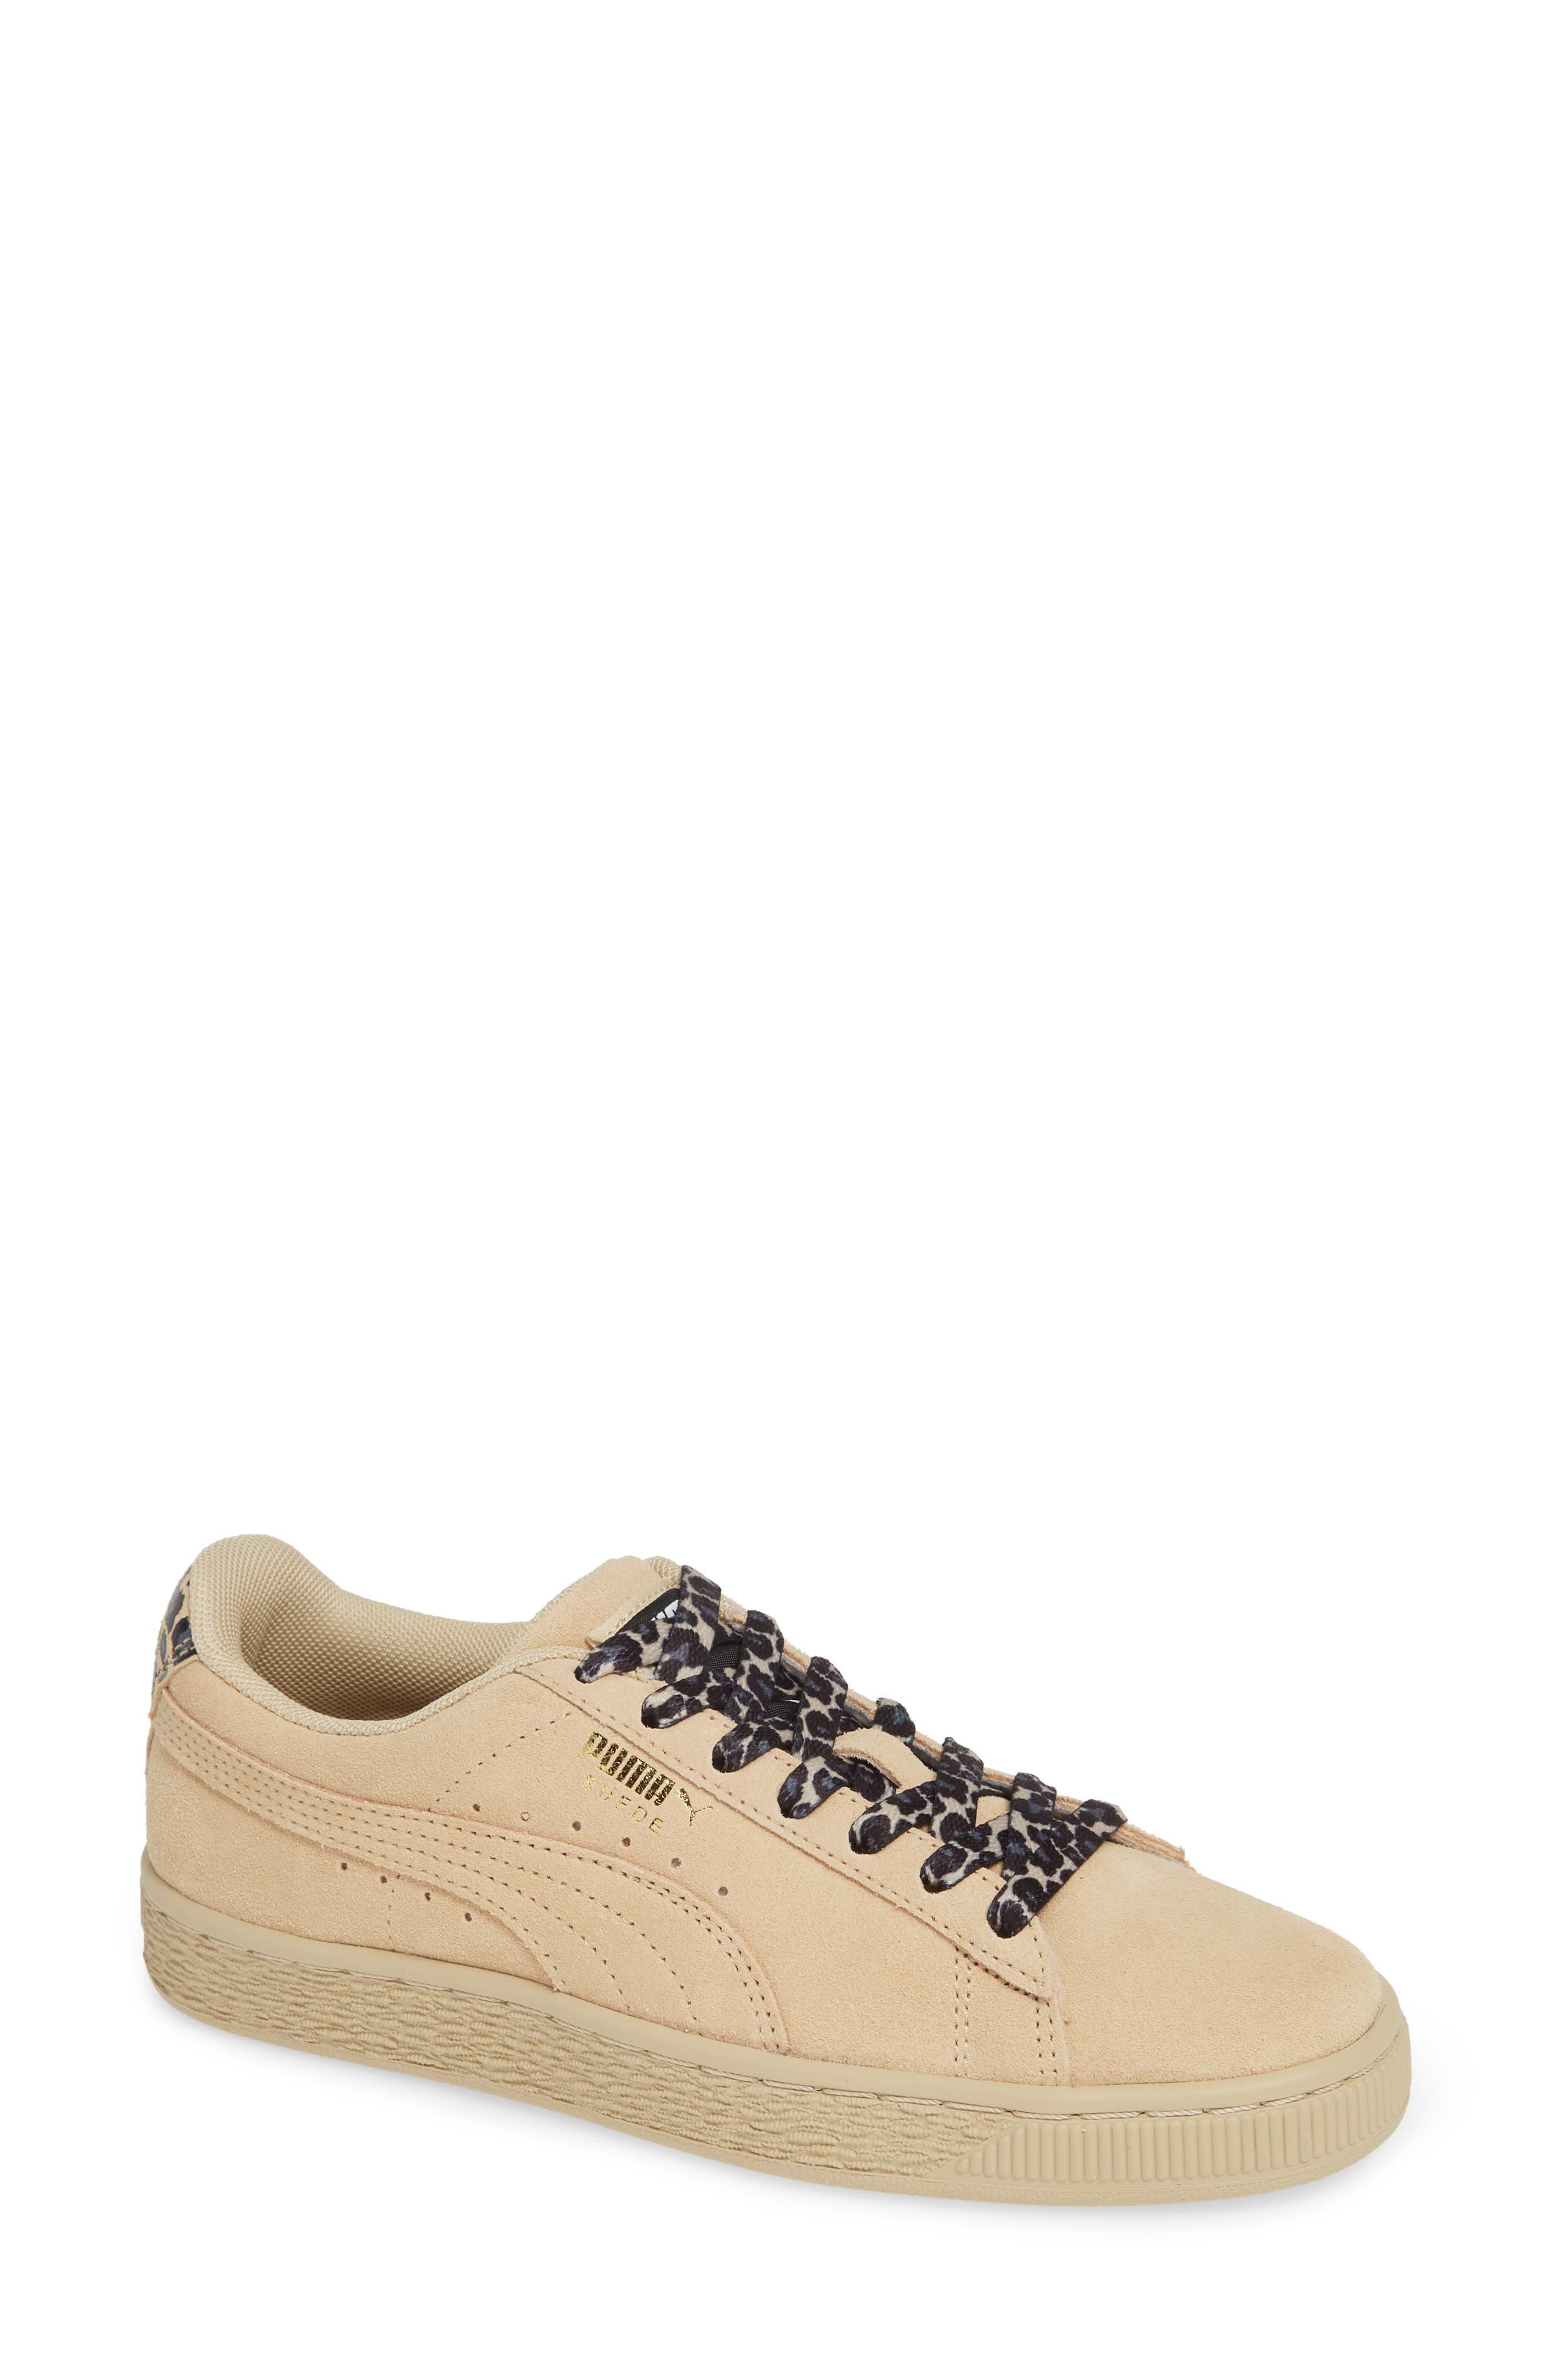 Suede Wild Sneaker,                             Main thumbnail 1, color,                             BLACK/ TEAM GOLD/ PEBBLE